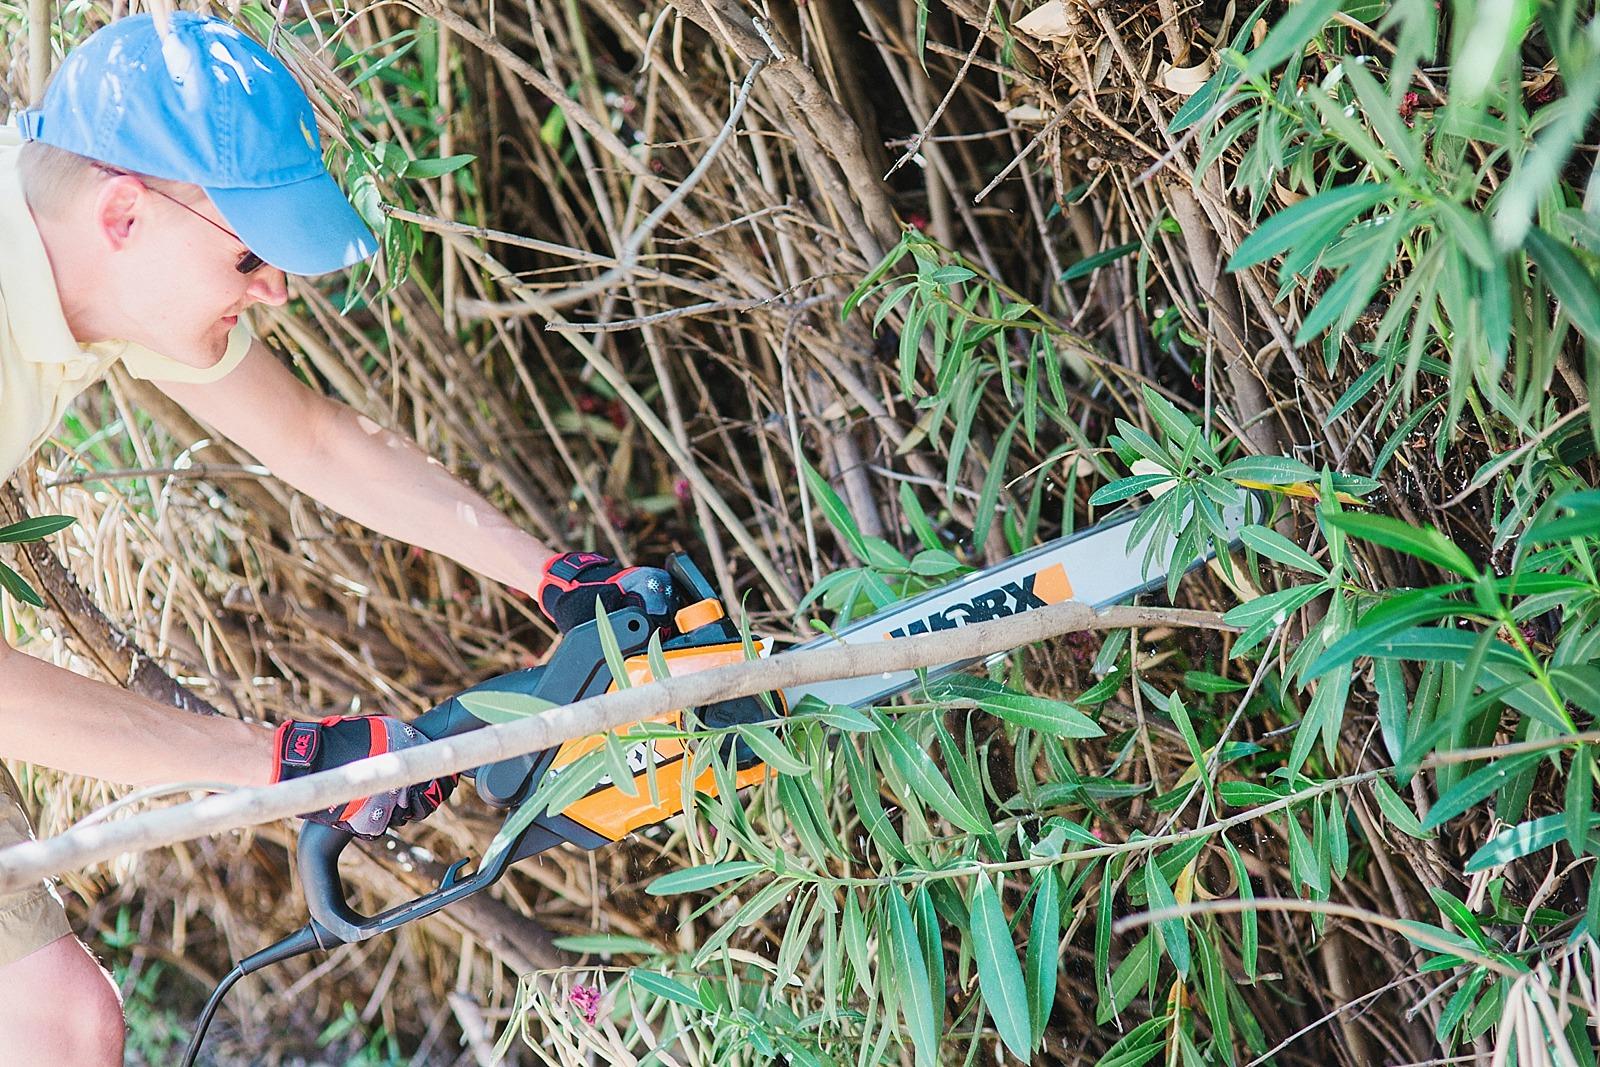 worx-chain-saw-review-gardening-blogger-home-diana-elizabeth-115a